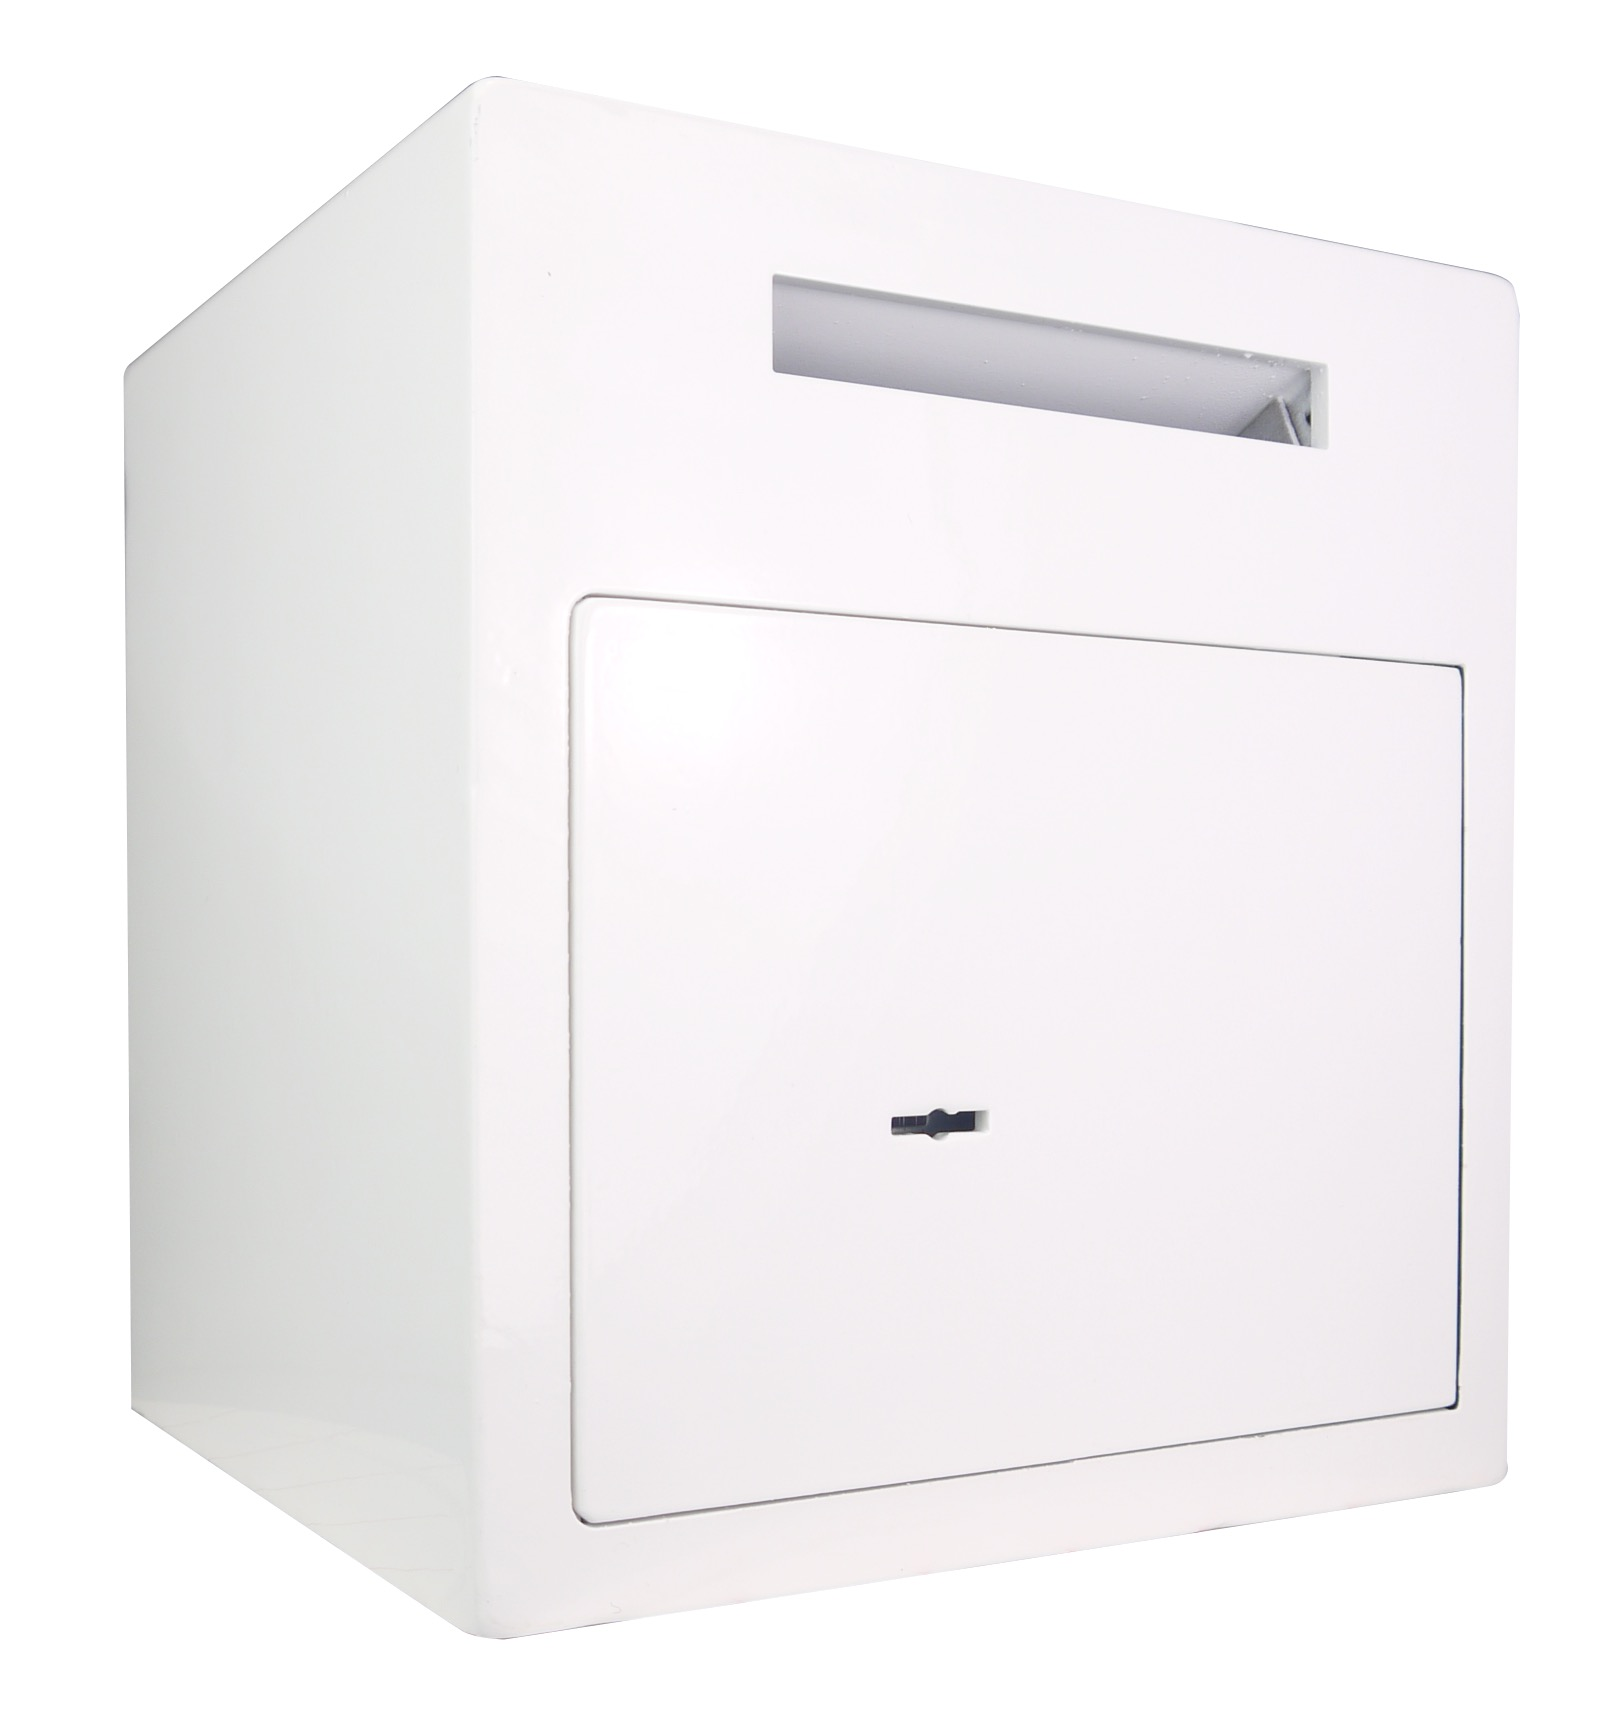 einwurftresor sicherheitsstufe b vdma 24992 schl sselschloss ebay. Black Bedroom Furniture Sets. Home Design Ideas